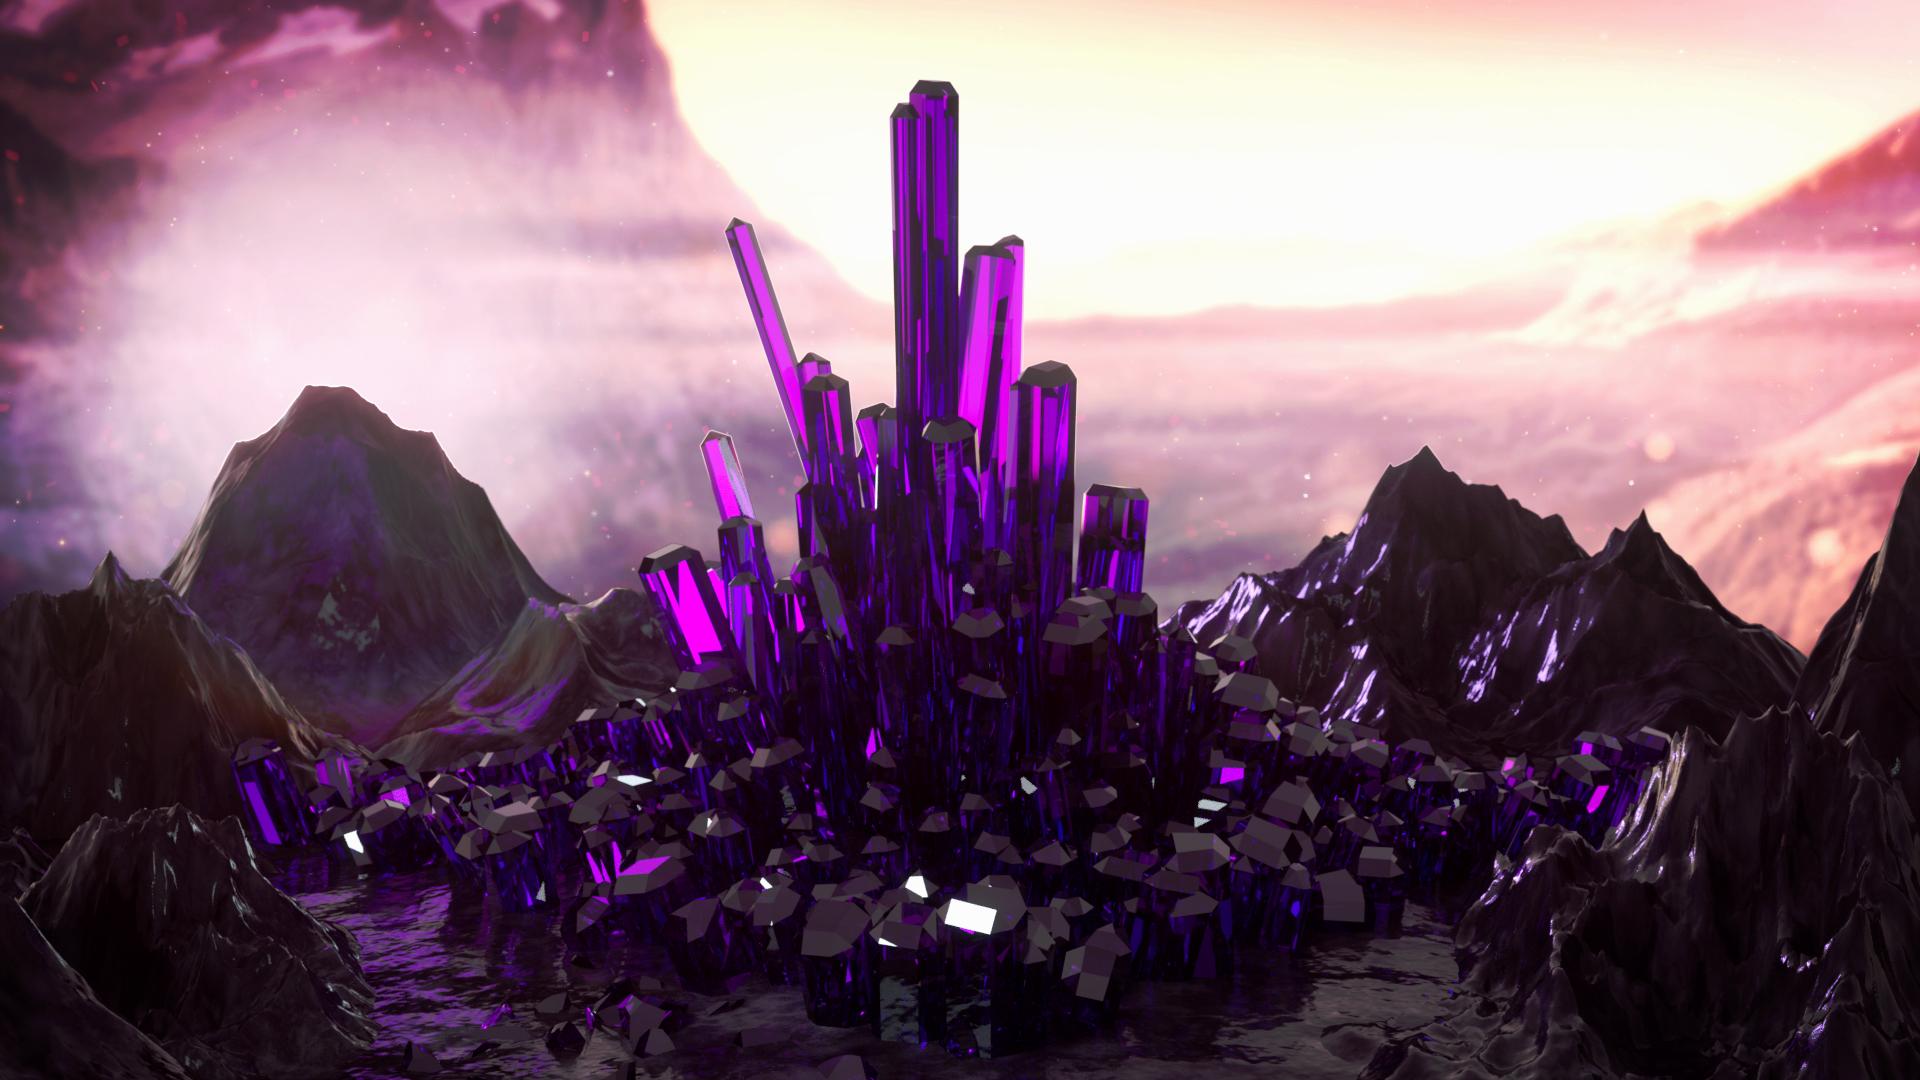 General 1920x1080 crystal  landscape pink violet reflection 3D Abstract